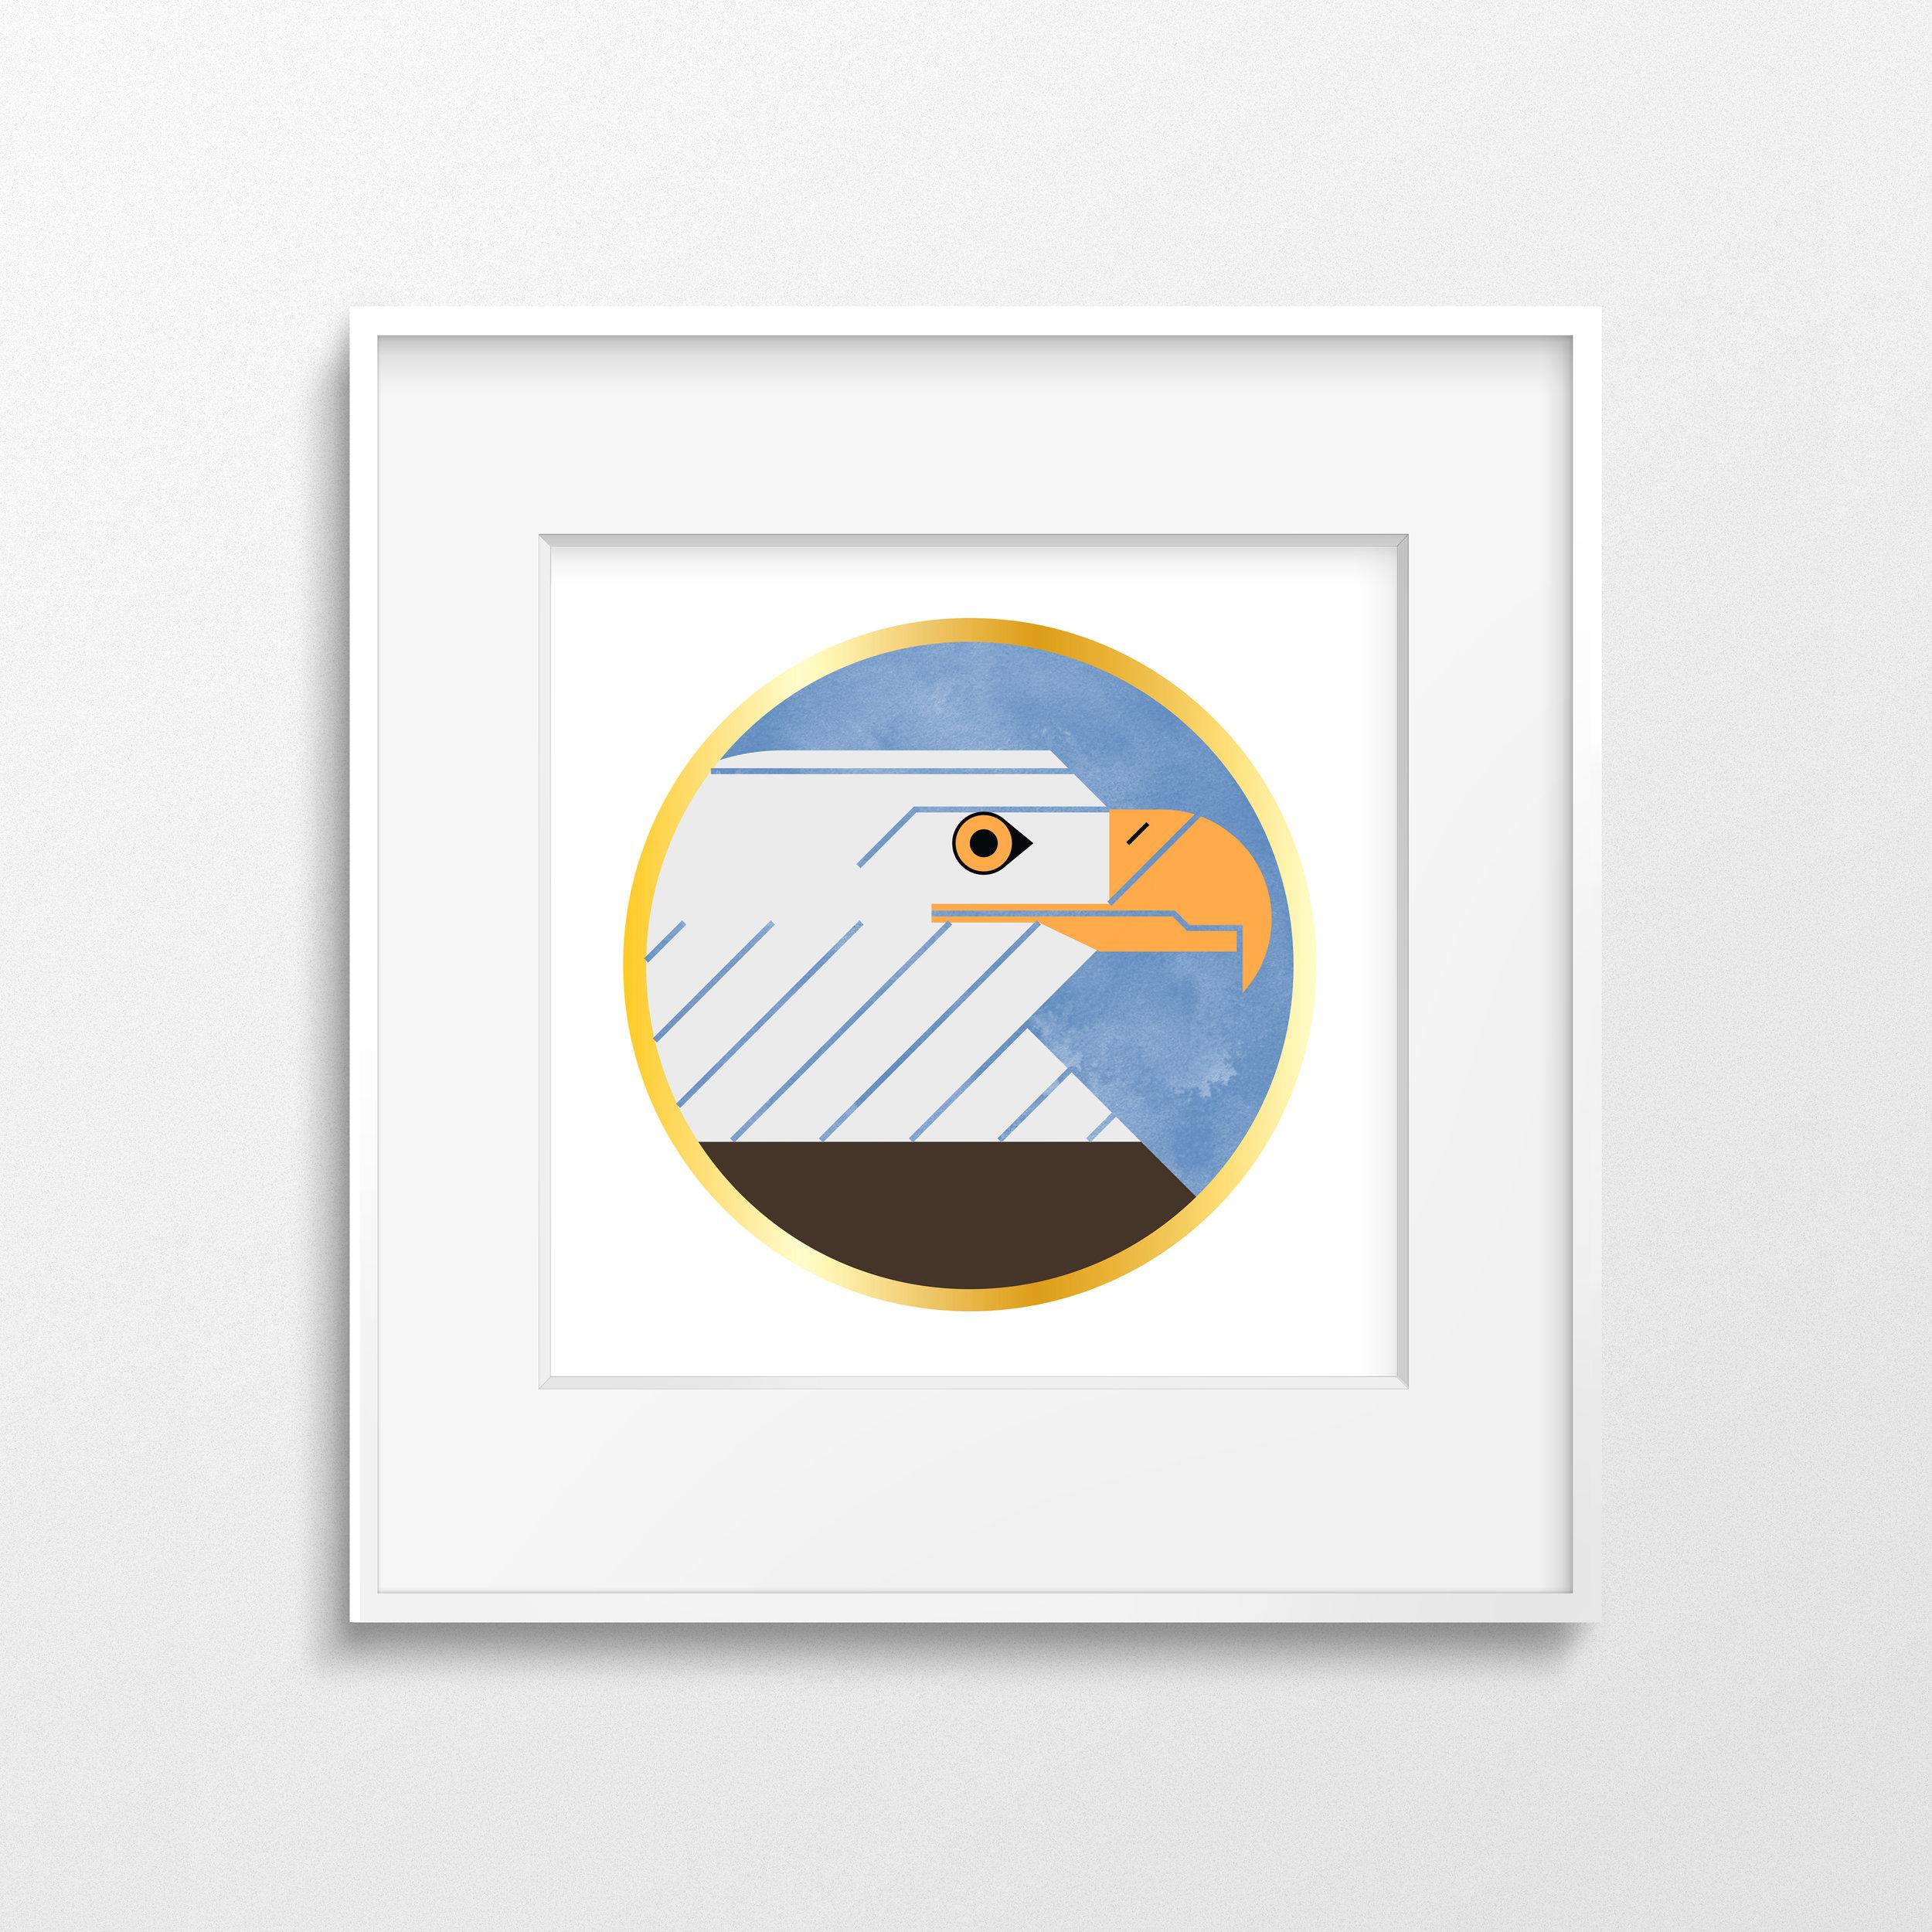 Bald Eagle White Frame2 (Thin).jpg